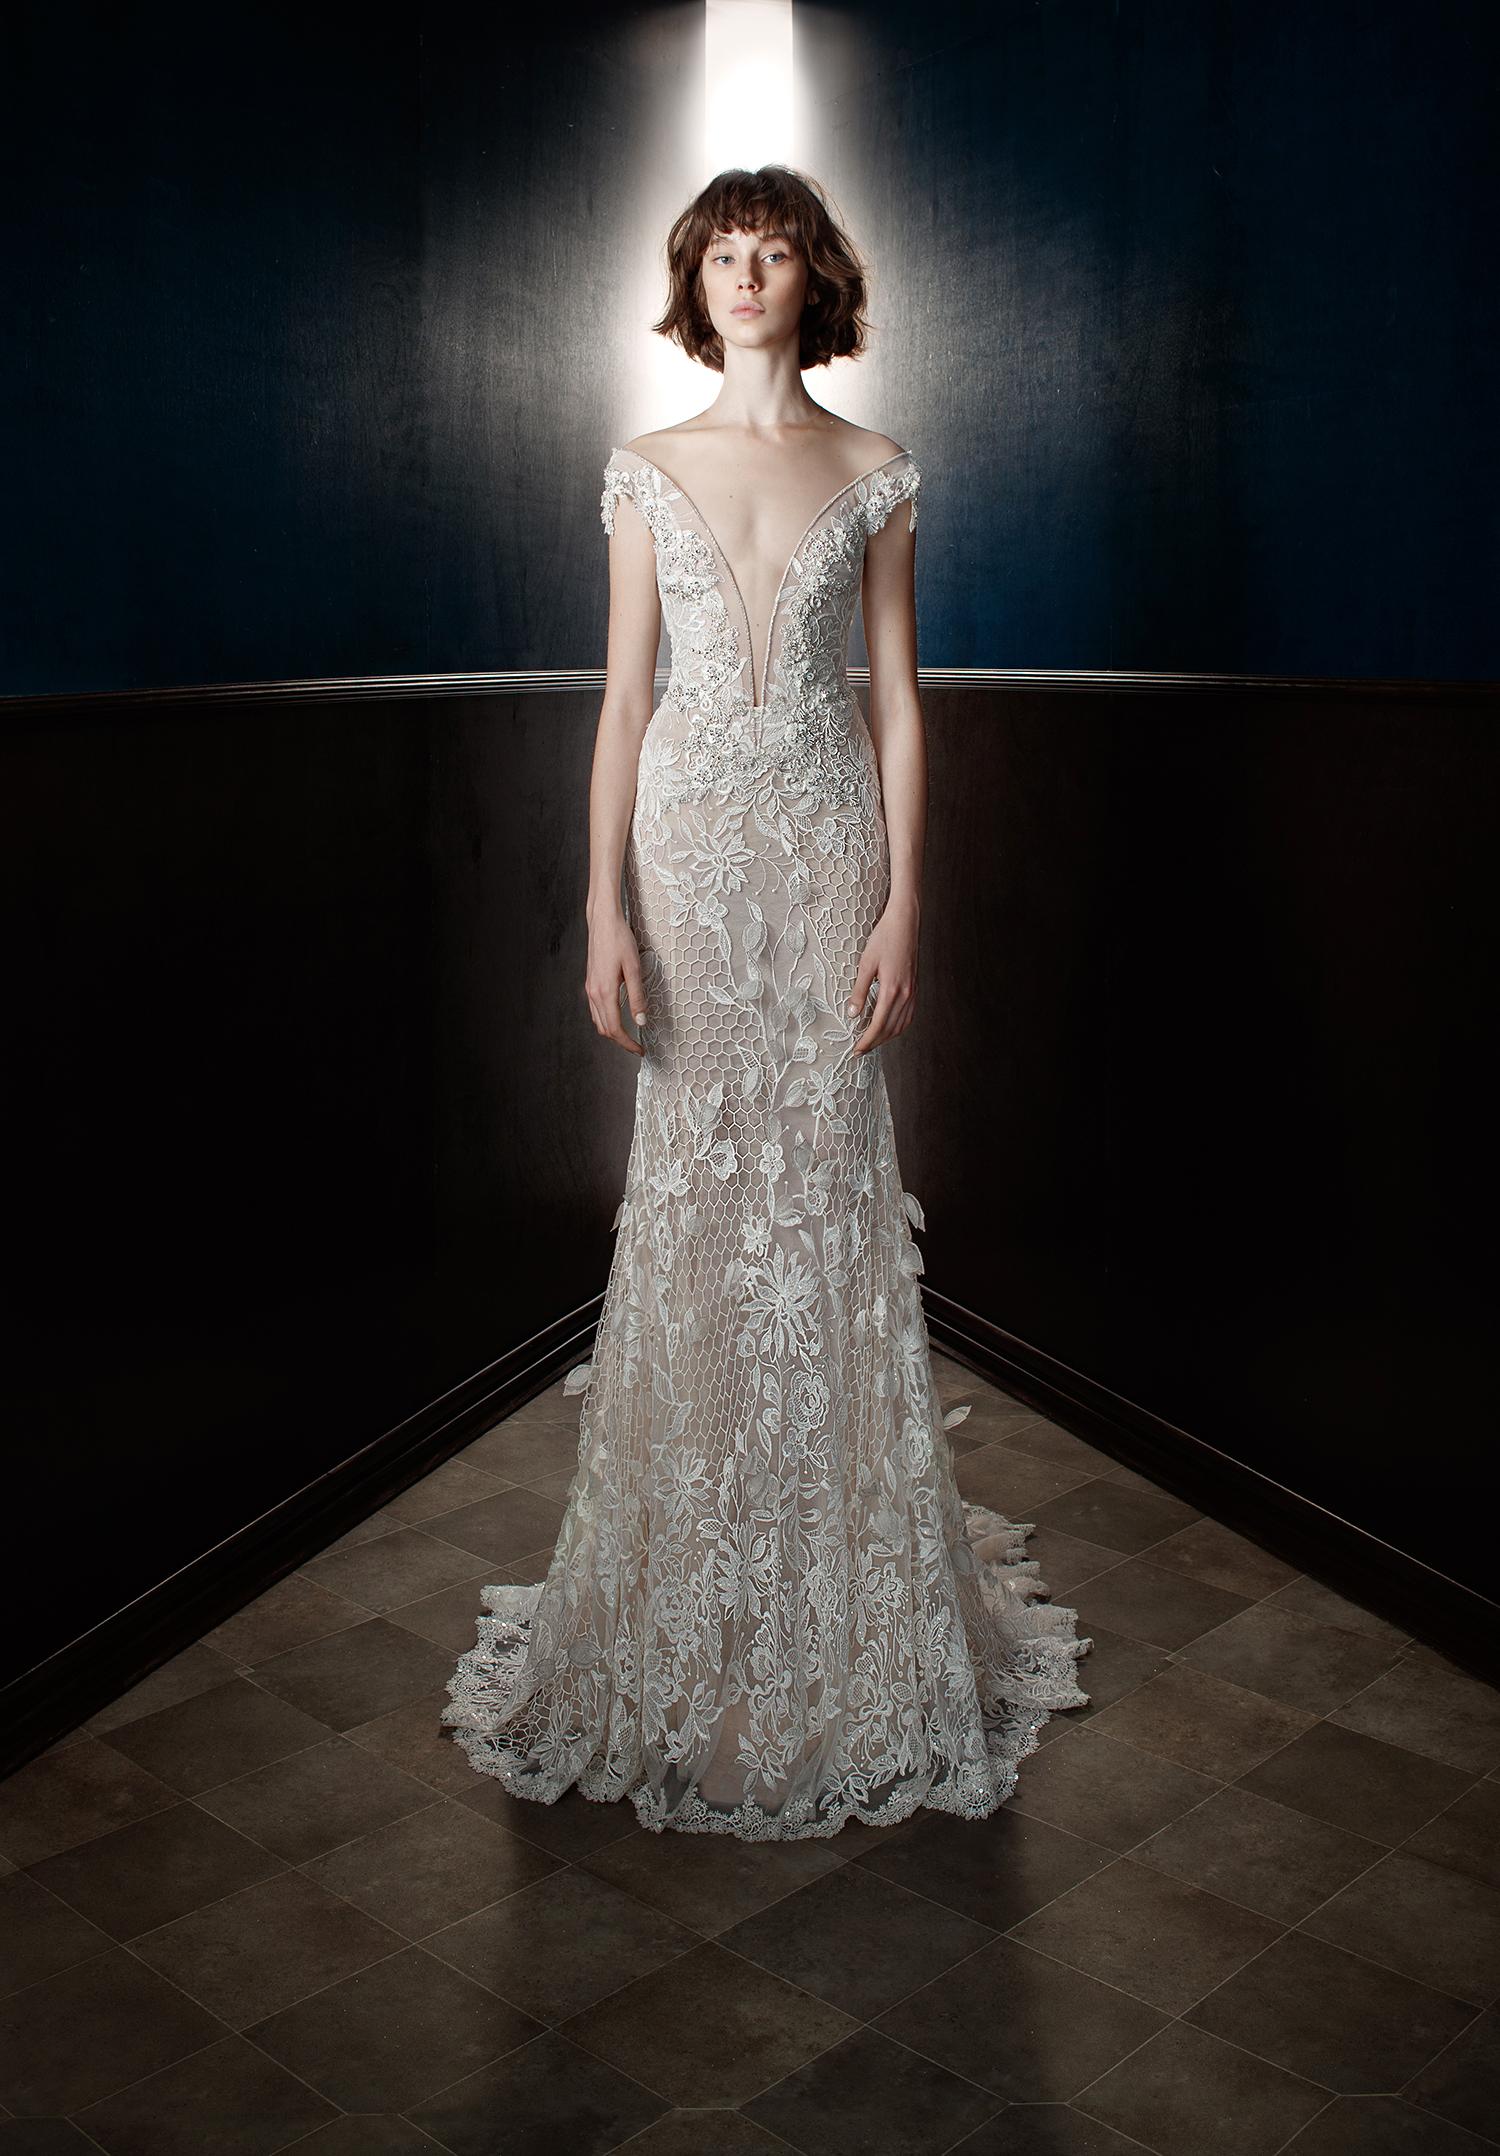 galia lahav wedding dress spring 2018 off-the-shoulder lace v-neck